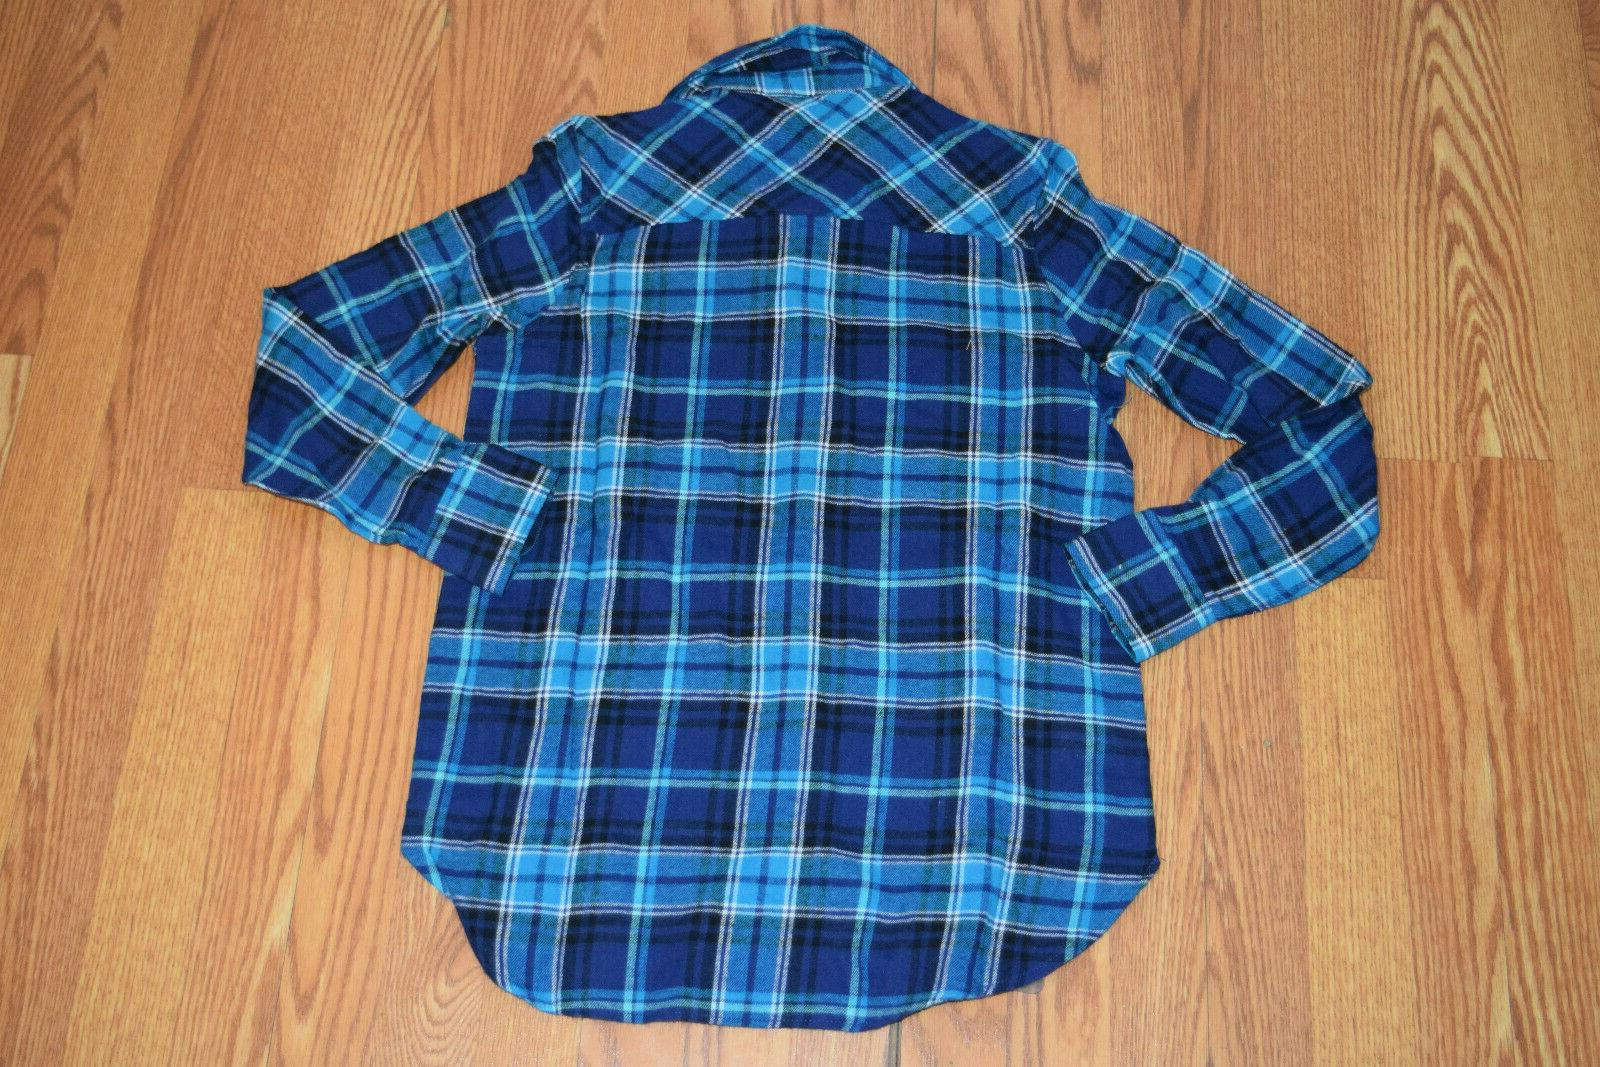 NWT Womens Blue Shirt Medium $59